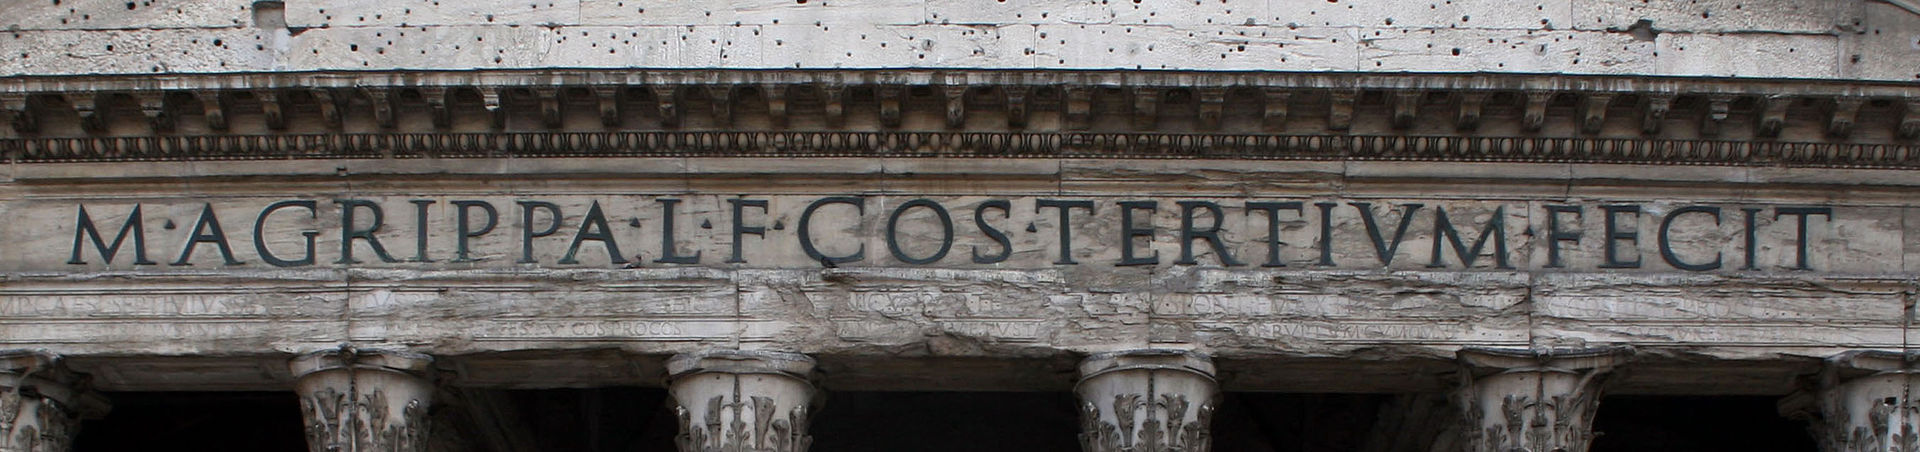 Panteón Agrippa con inscripción letras romanas cuadradas